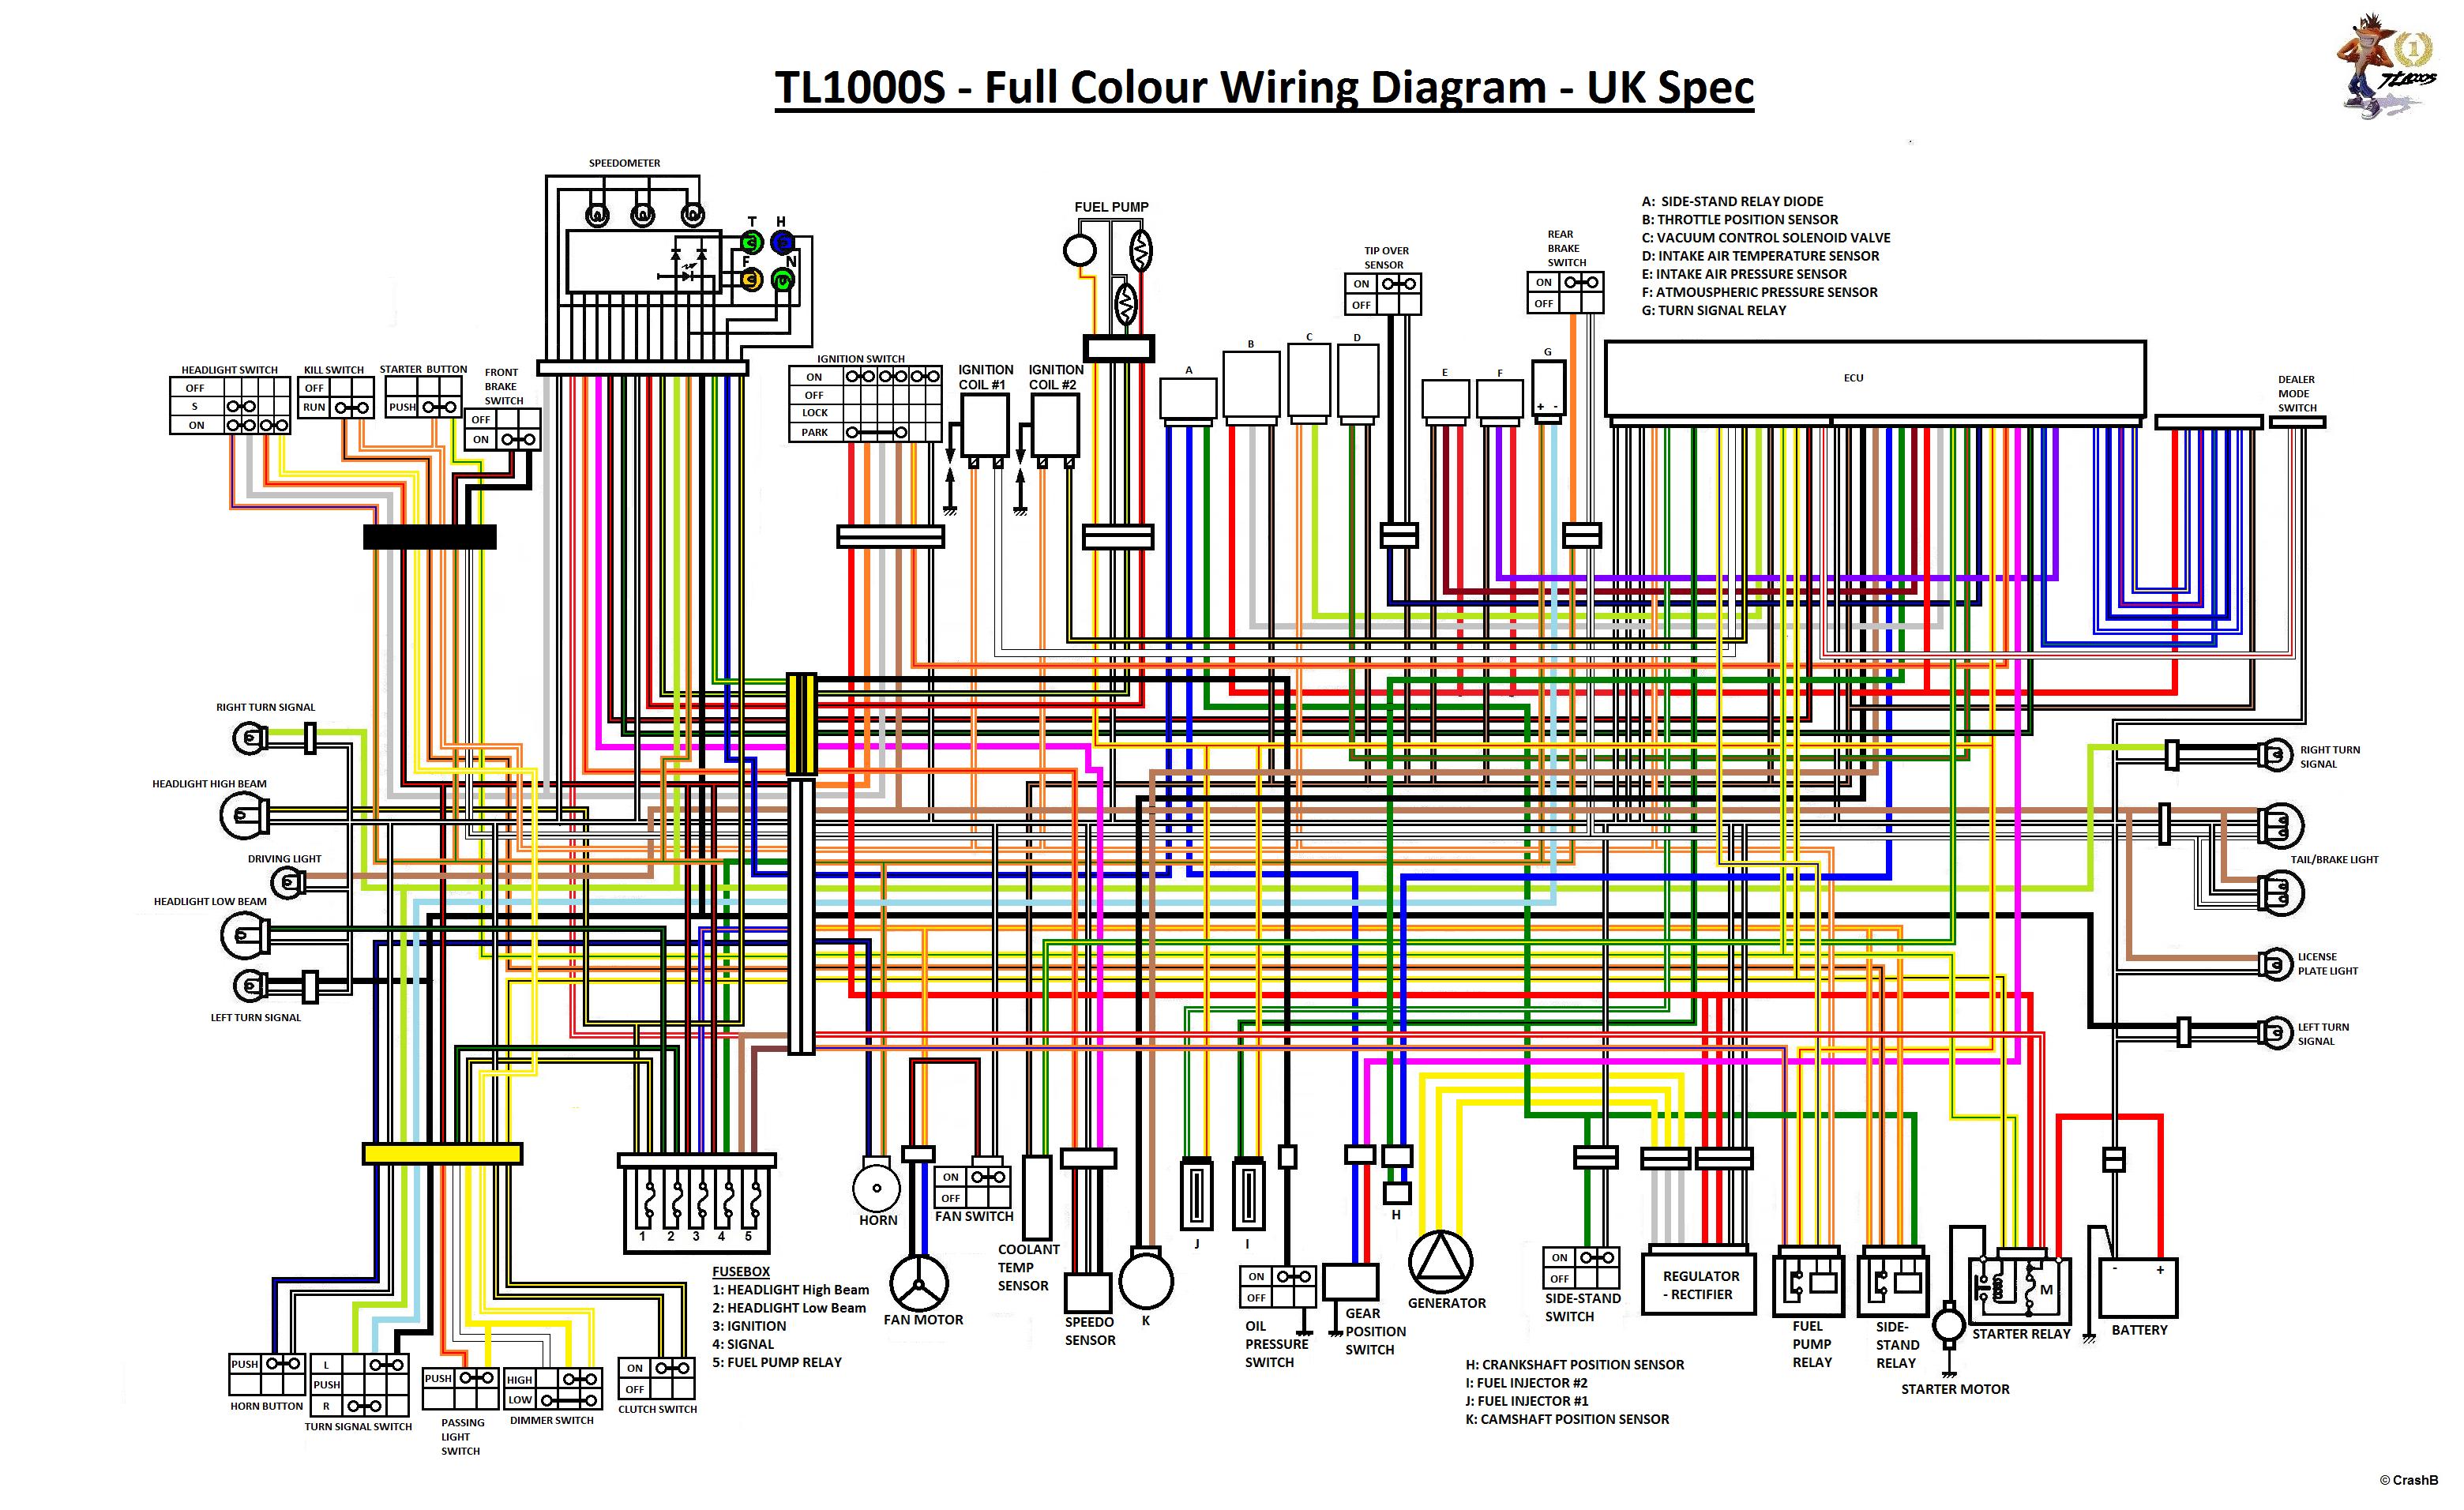 2000 Suzuki Vitara Cooling Diagram Electrical Wiring Diagrams Grand Engine Sv650 Custom U2022 Xl